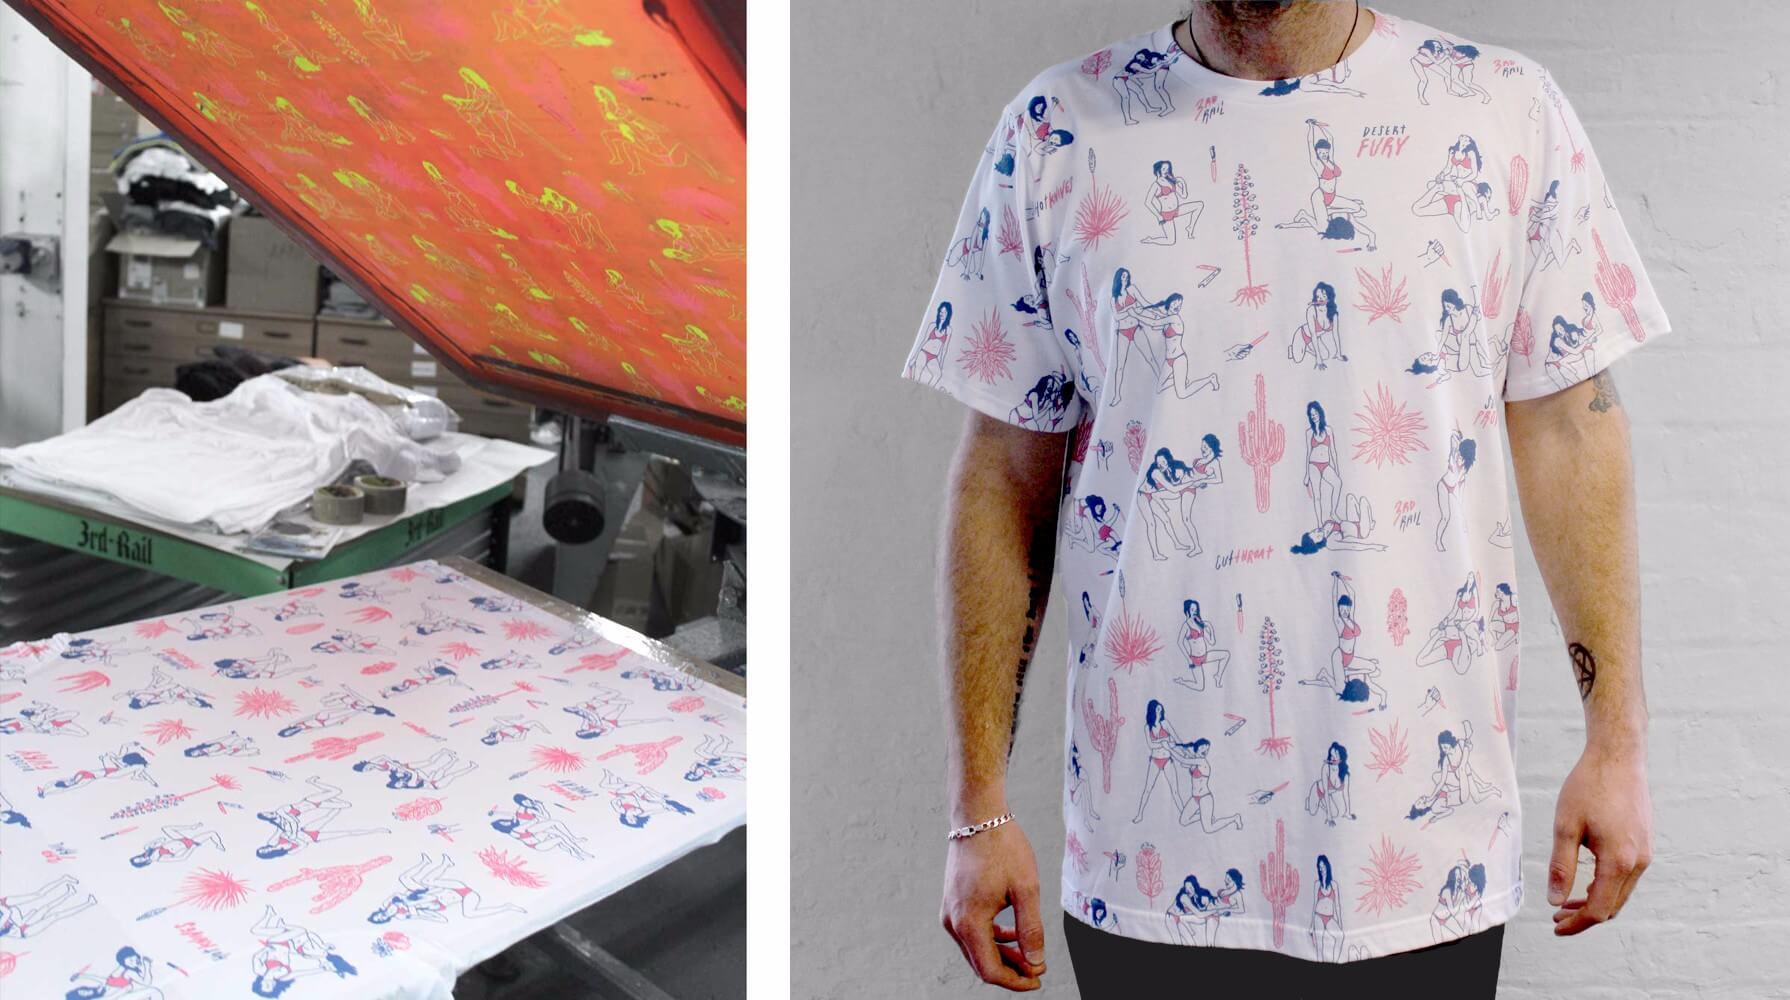 Sean Morris x 3rd Rail for Pick Me Up t-shirts.